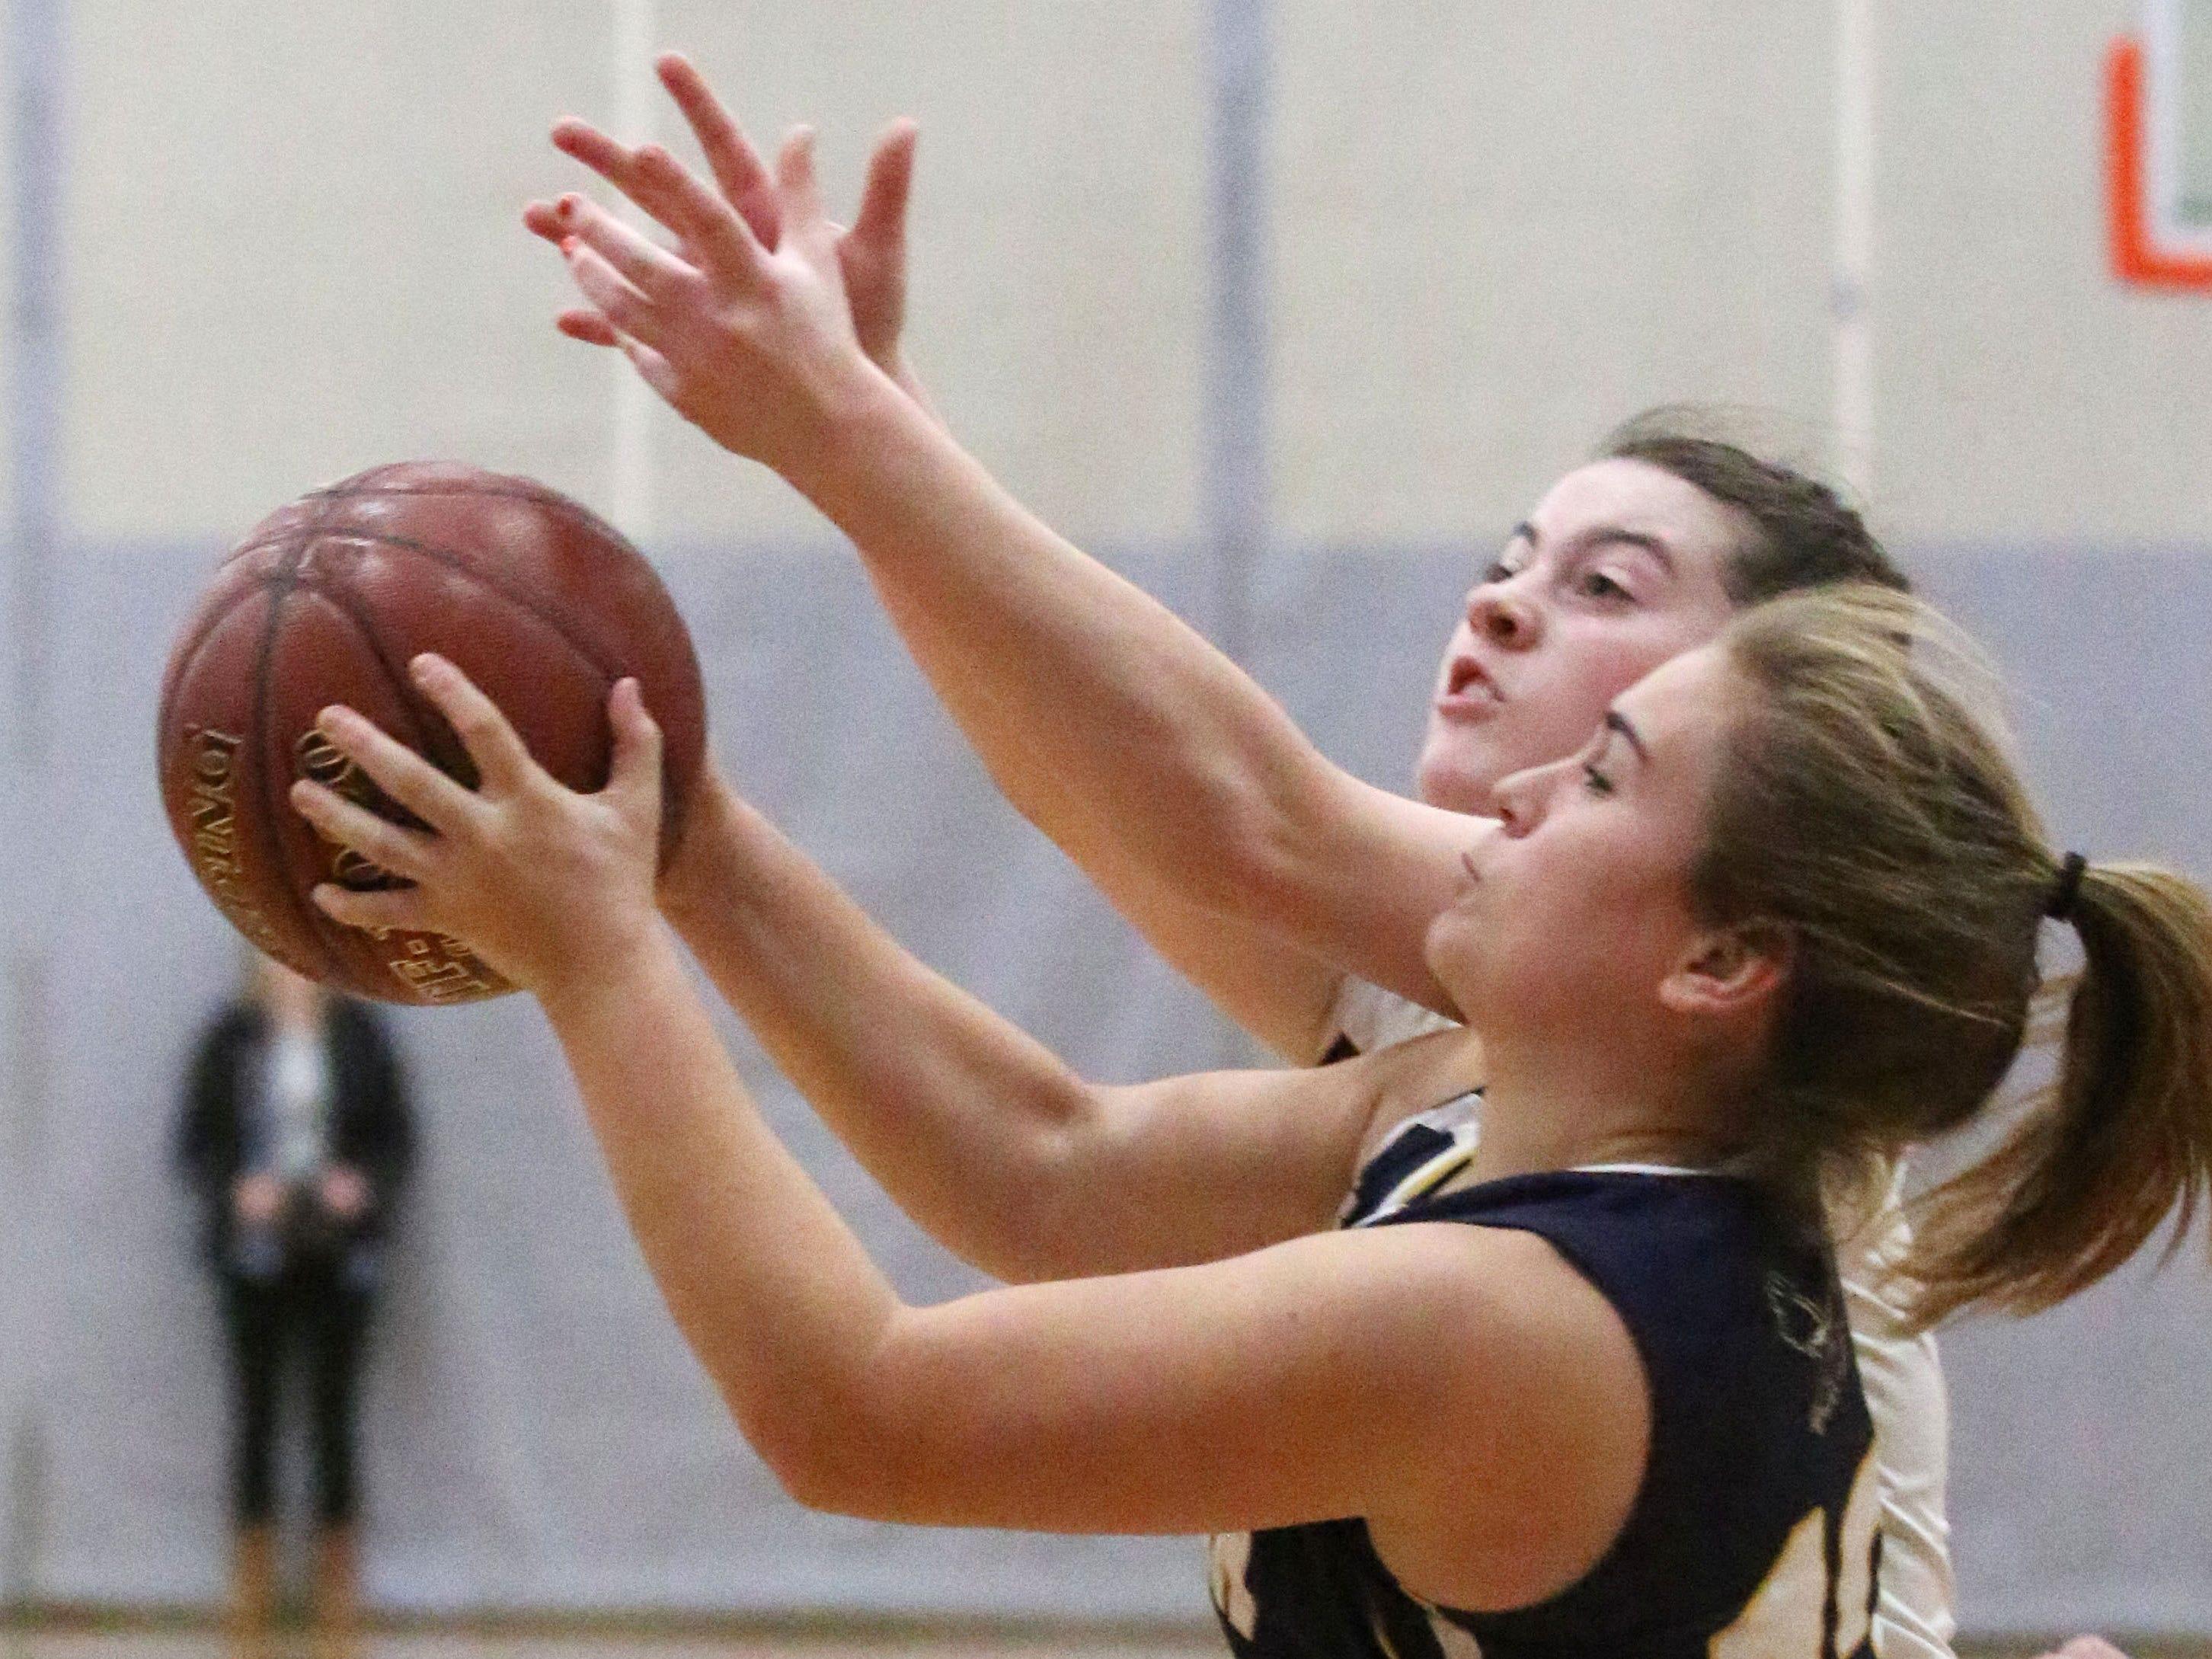 Sheboygan Christian's Megan Moeller (12) rebounds the ball by Cedar Grove-Belgium's Maycie Navis (12), Tuesday, December 4, 2018, in Cedar Grove, Wis.